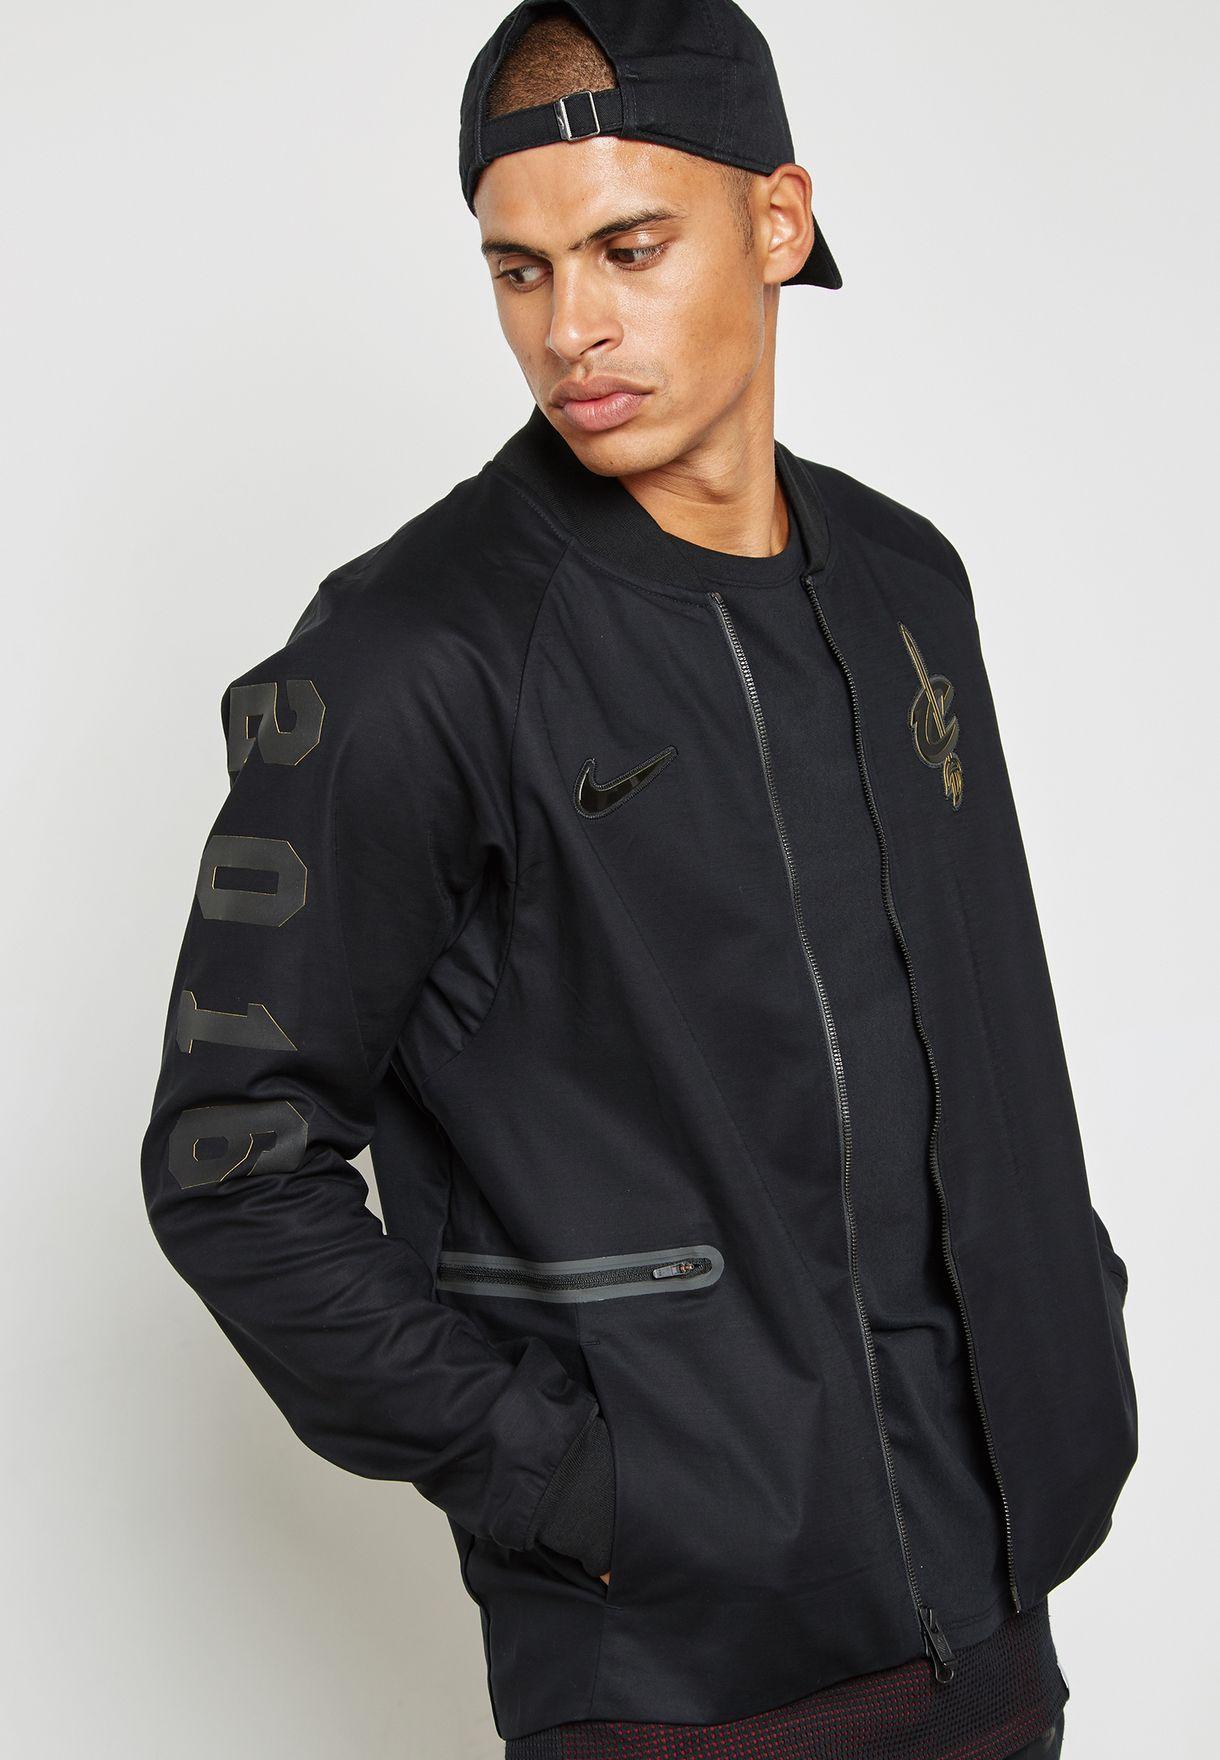 c46425391d99 Shop Nike black Cleveland Cavaliers Varsity Jacket 860791-010 for ...